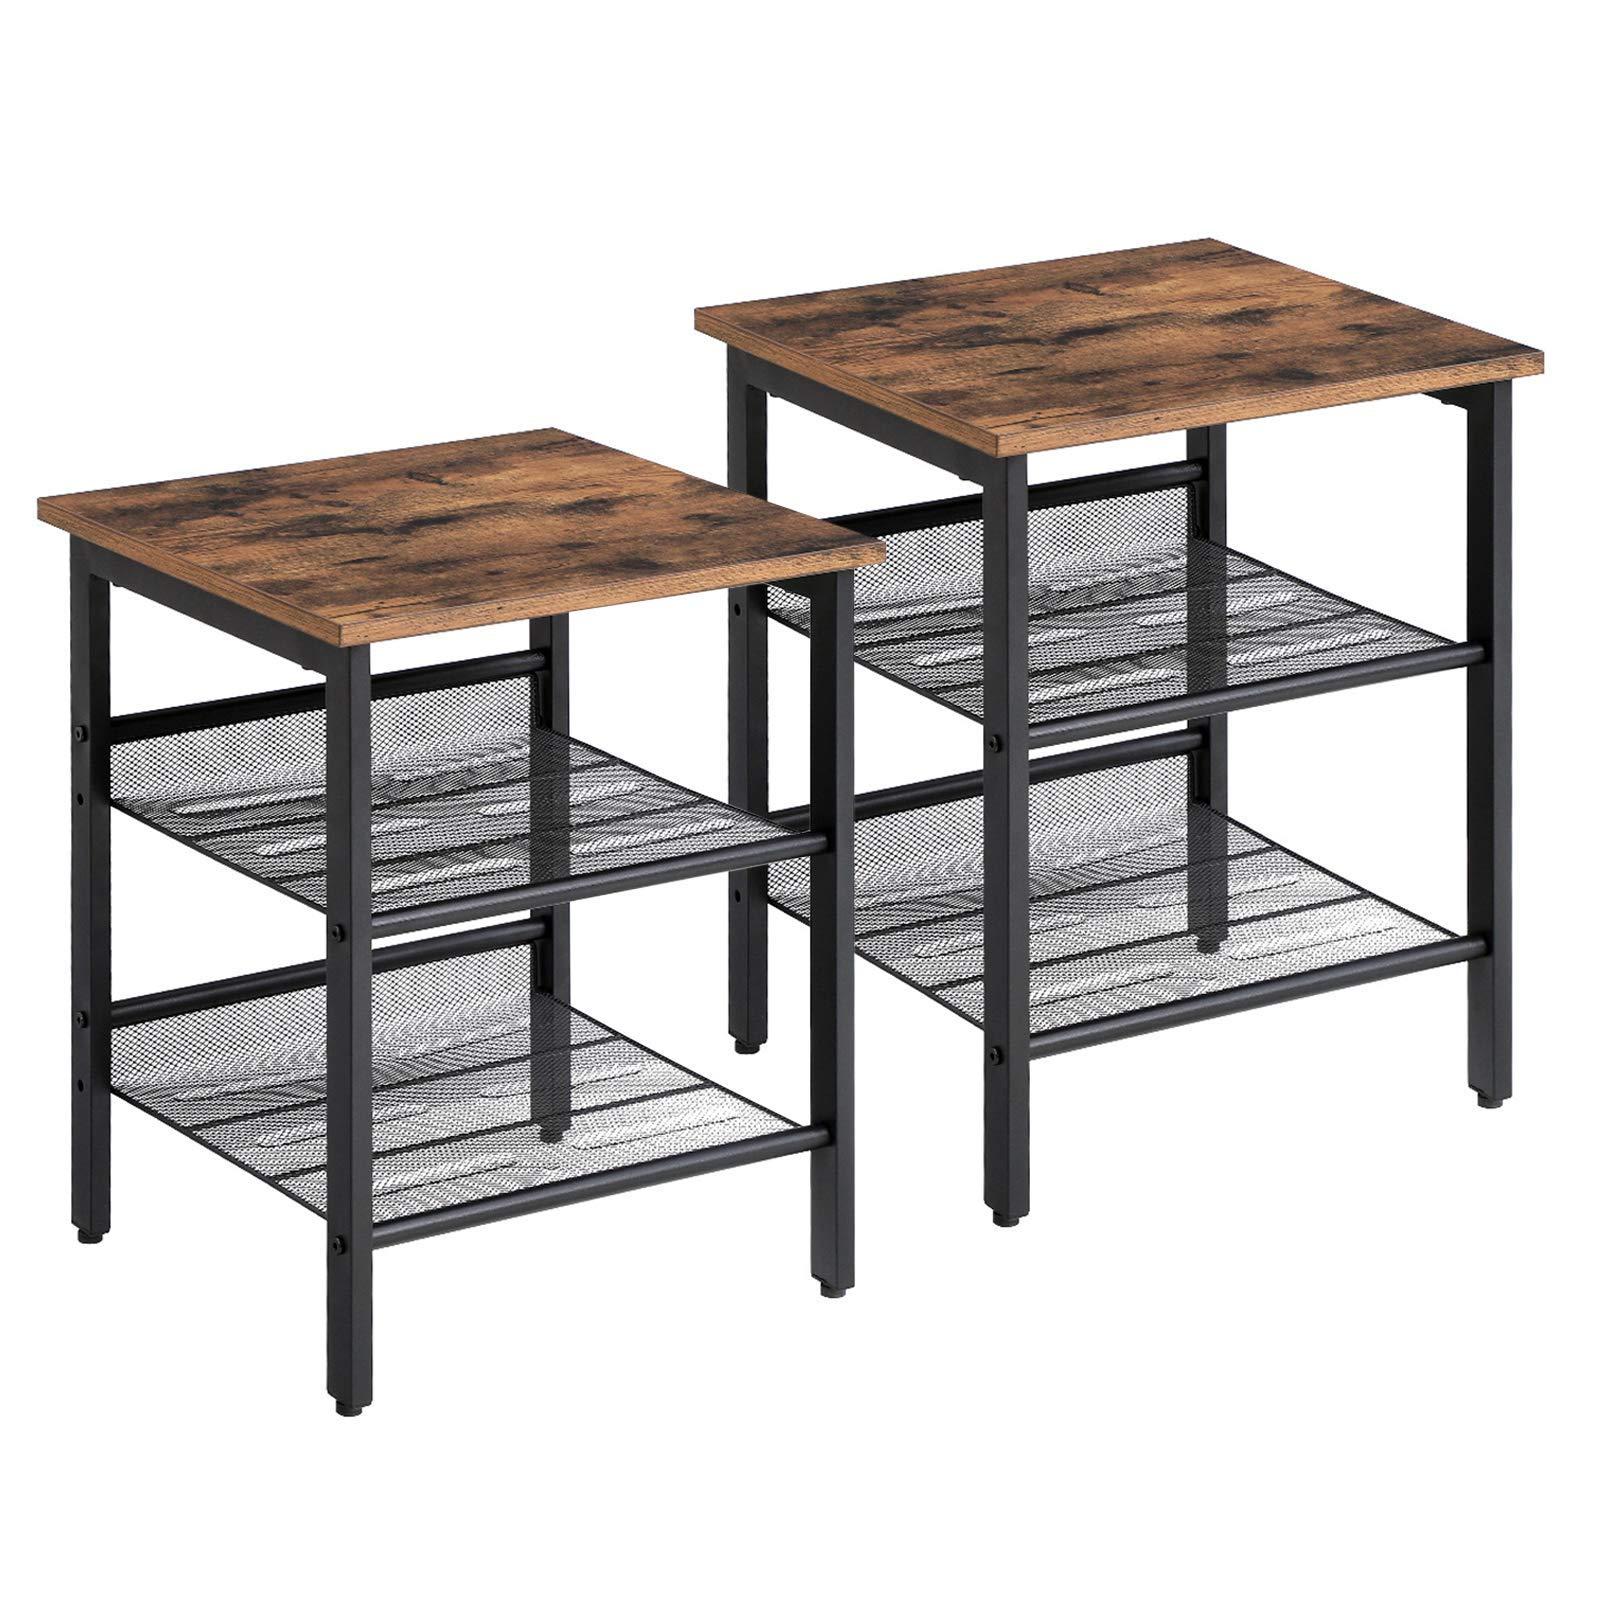 VASAGLE Side Table Set, Nightstand, Industrial Set of 2 Bedside Tables, with Adjustable Mesh Shelves, Living Room, Bedroom, Hallway, Office, Stable, Rustic Brown and Black LET24X